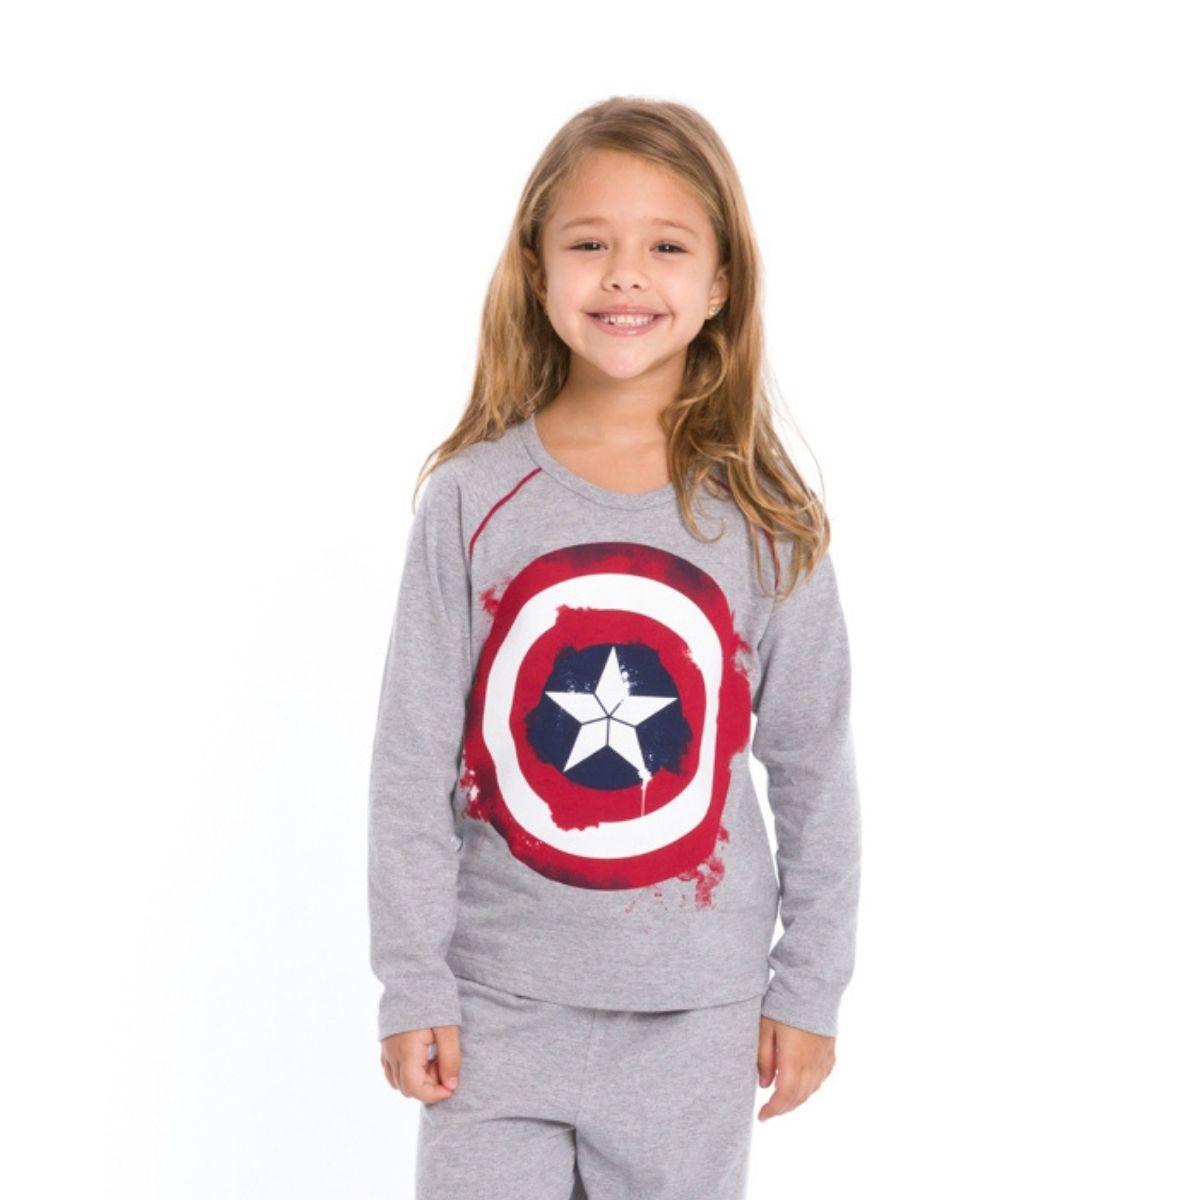 Pijama infantil menina capitã américa manga longa quentinho